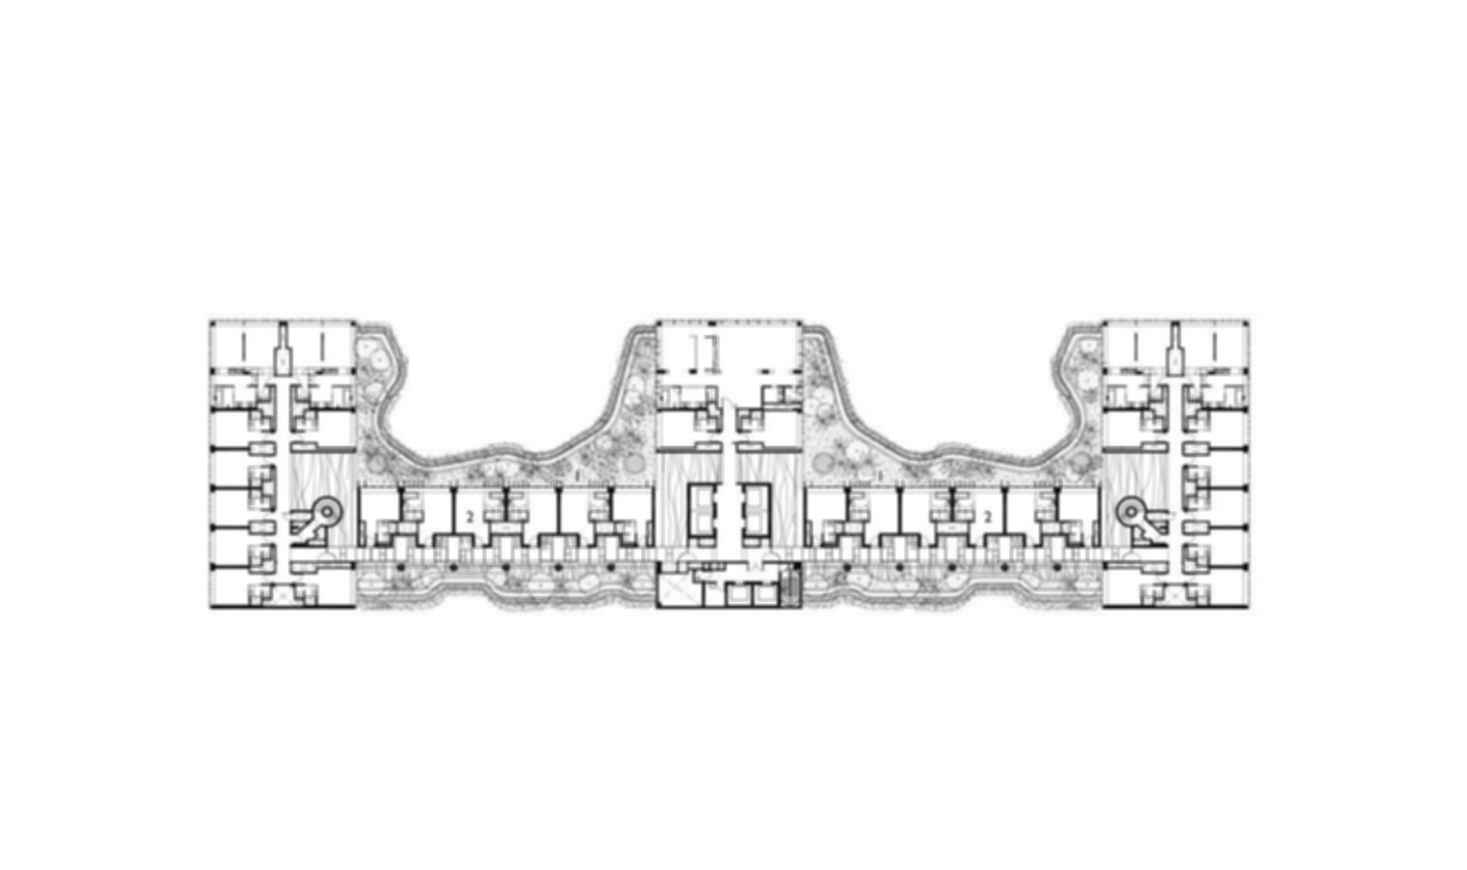 Parkroyal on Pickering - Site Plan